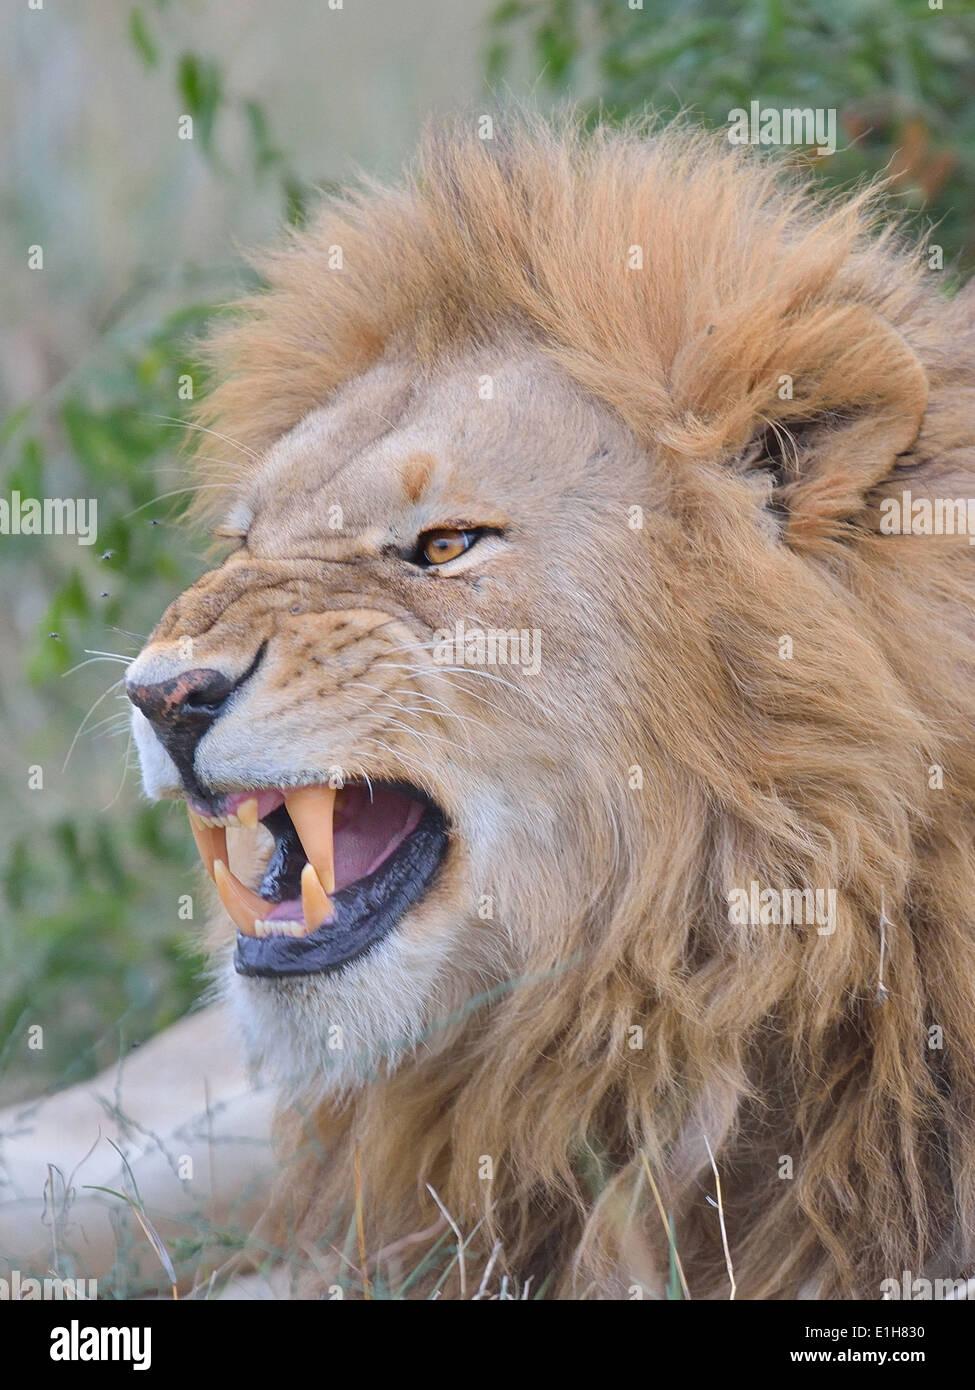 Portrait of a growling Masai Lion (Panthera leo nubica), Mara Triangle, Maasai Mara National Reserve, Narok, Kenya, Africa - Stock Image